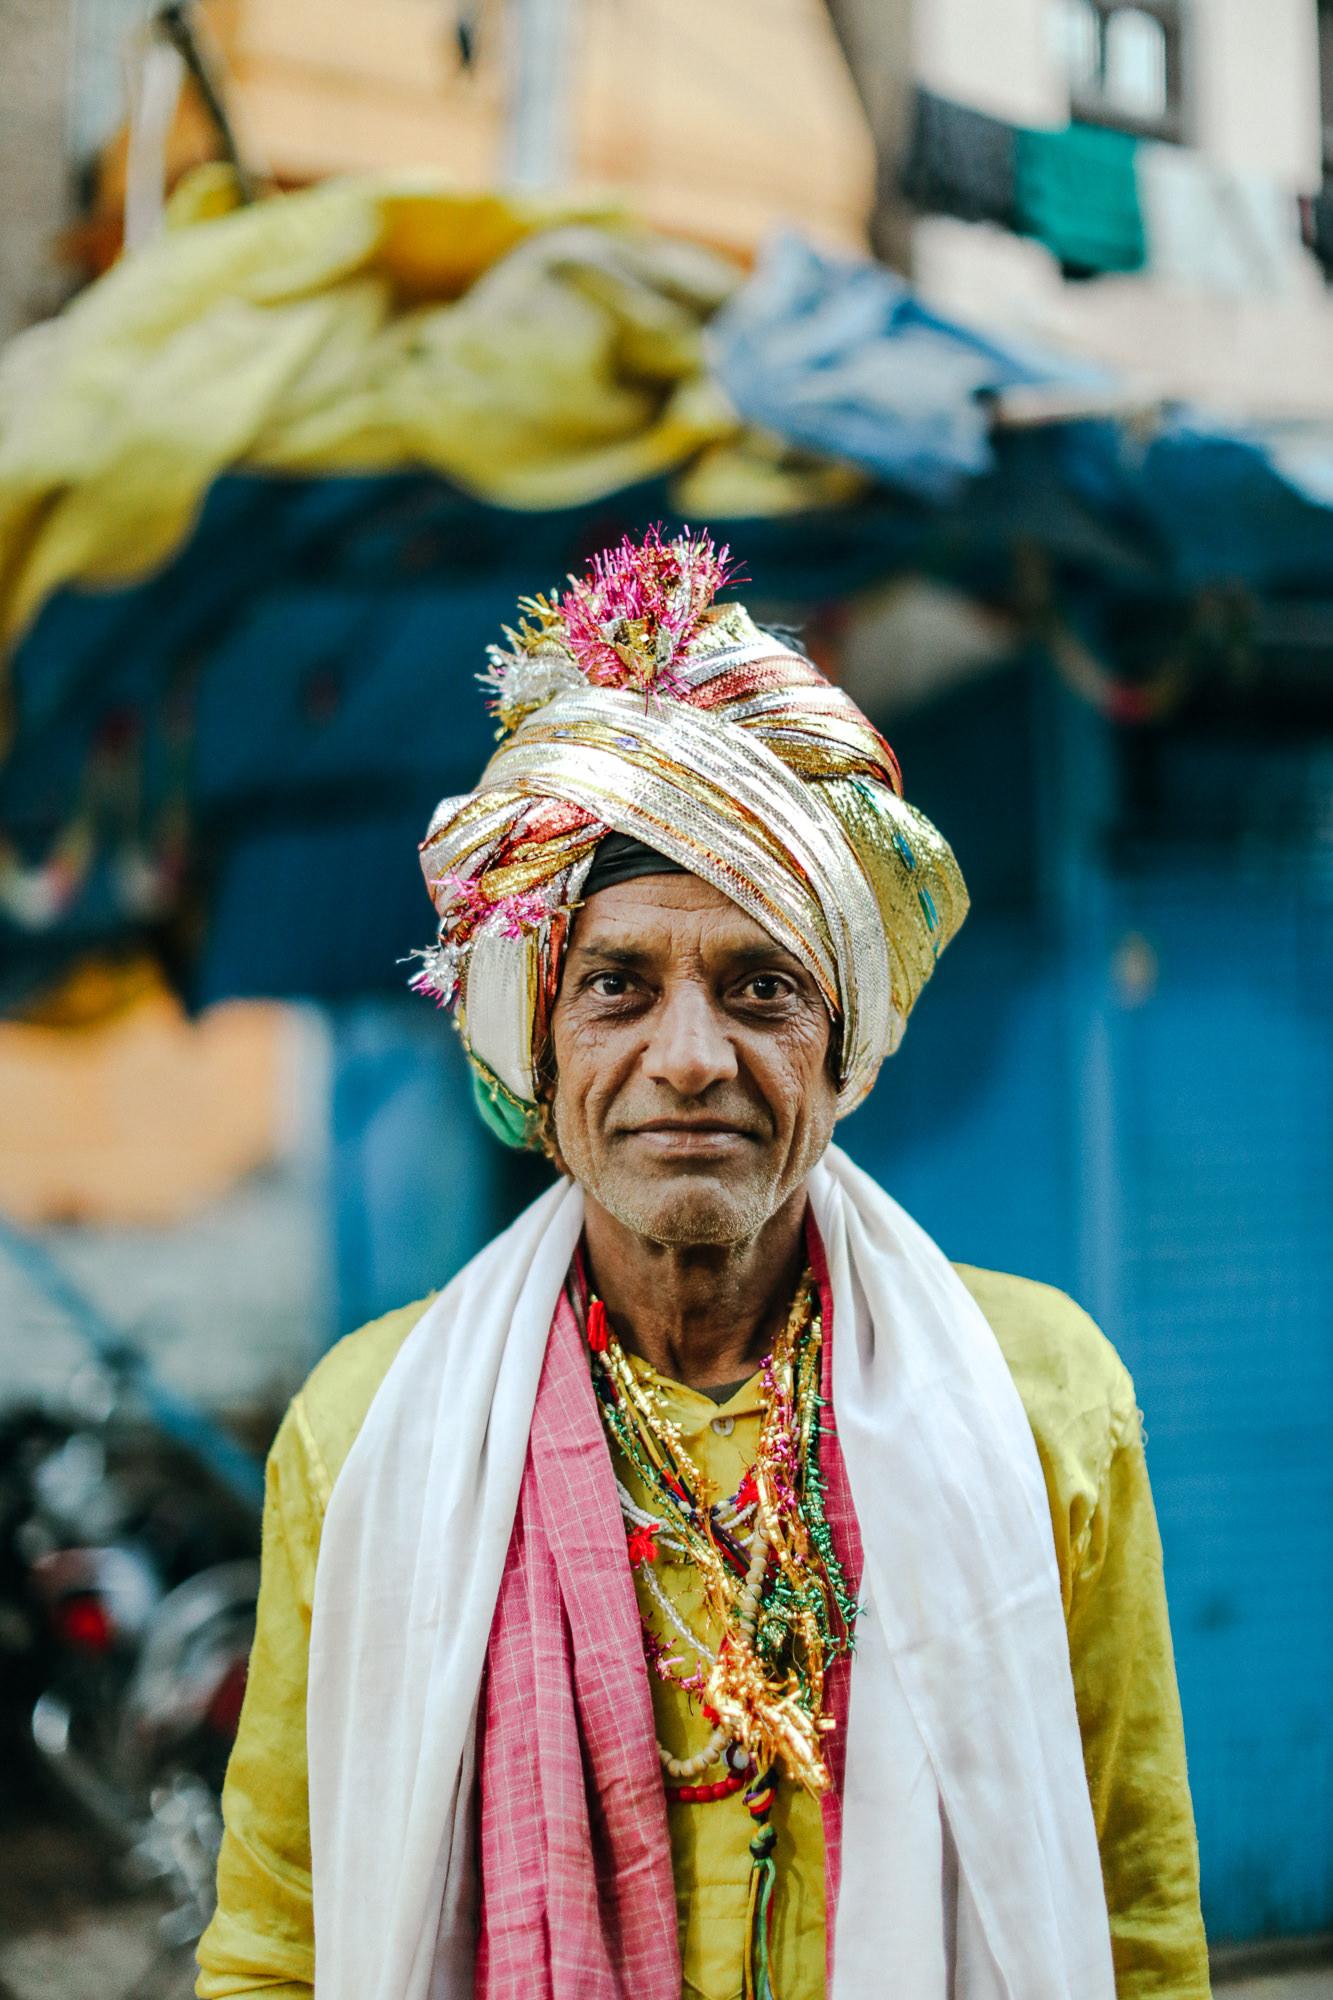 Categories: Honeymoon-Honeymoon - Rajasthan & Jaipur by Lara Hotz